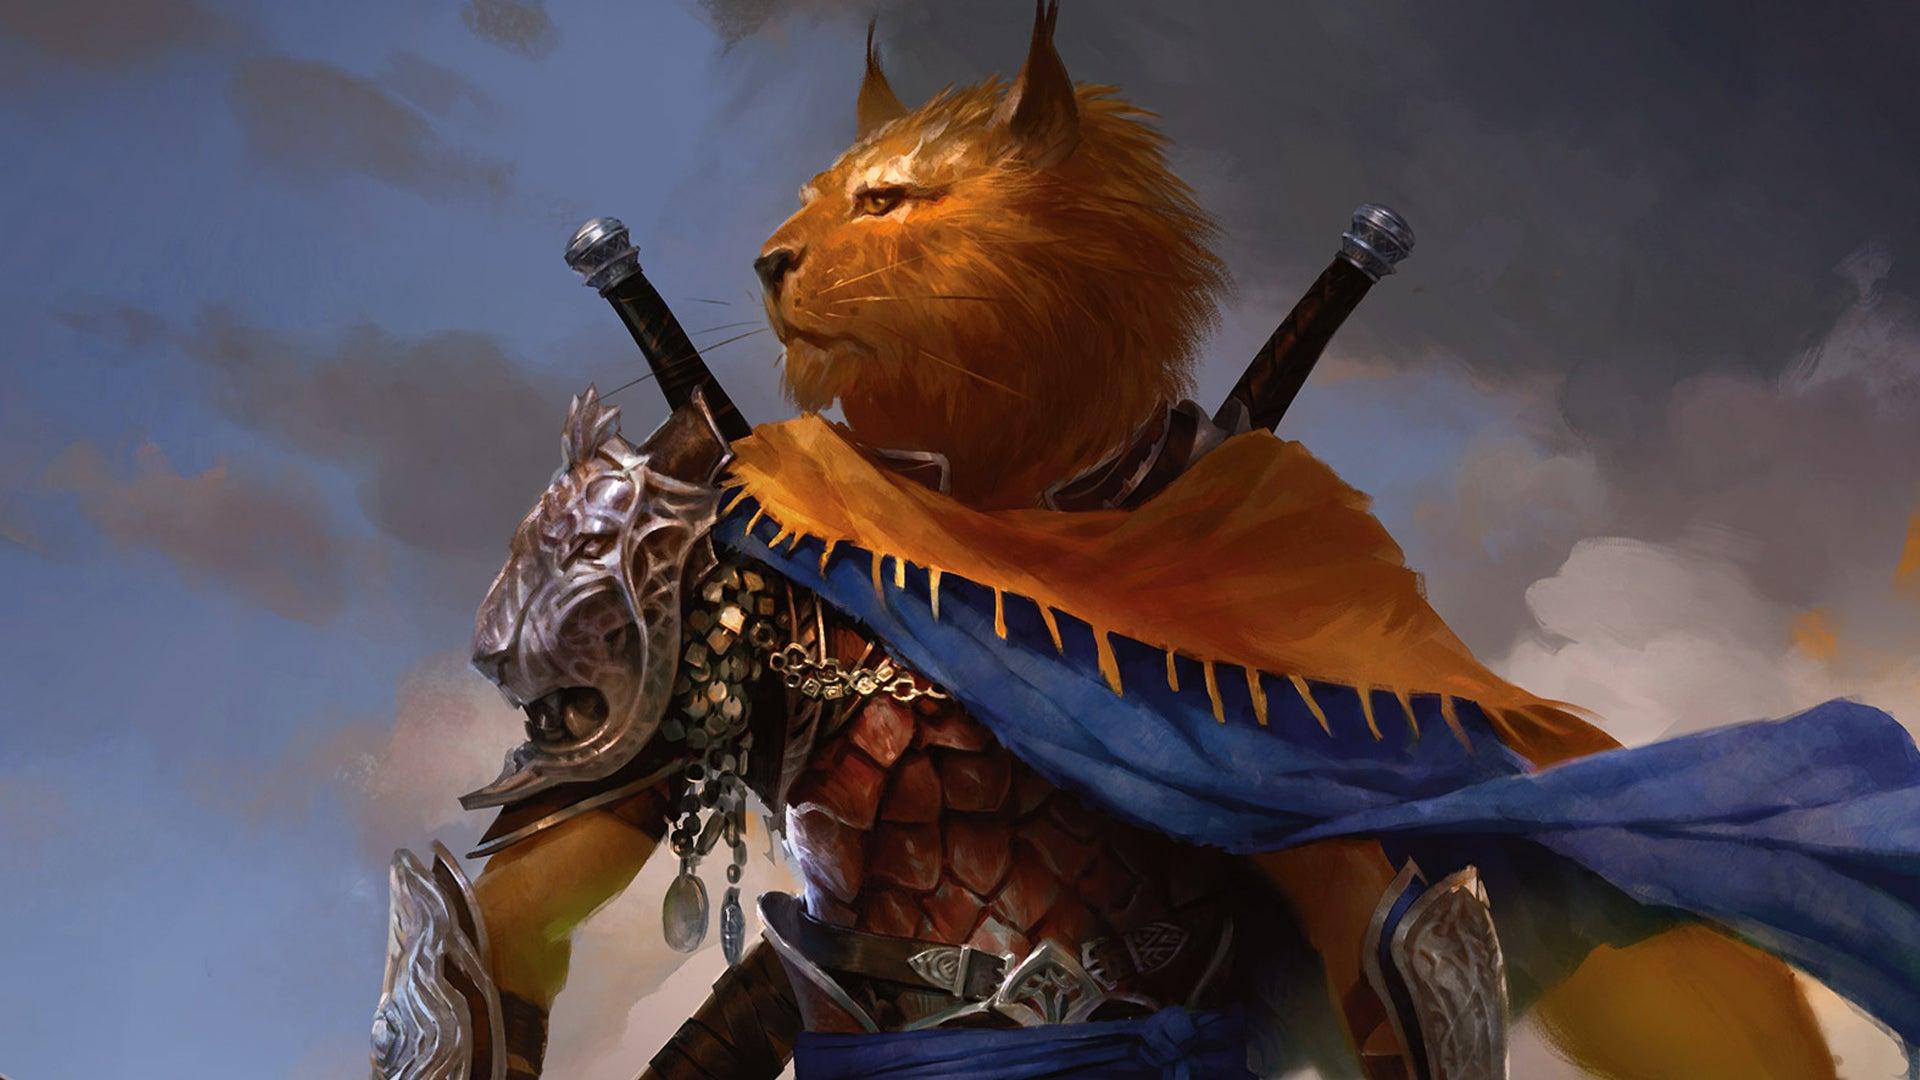 magic-the-gathering-balan-wandering-knight-artwork.jpg